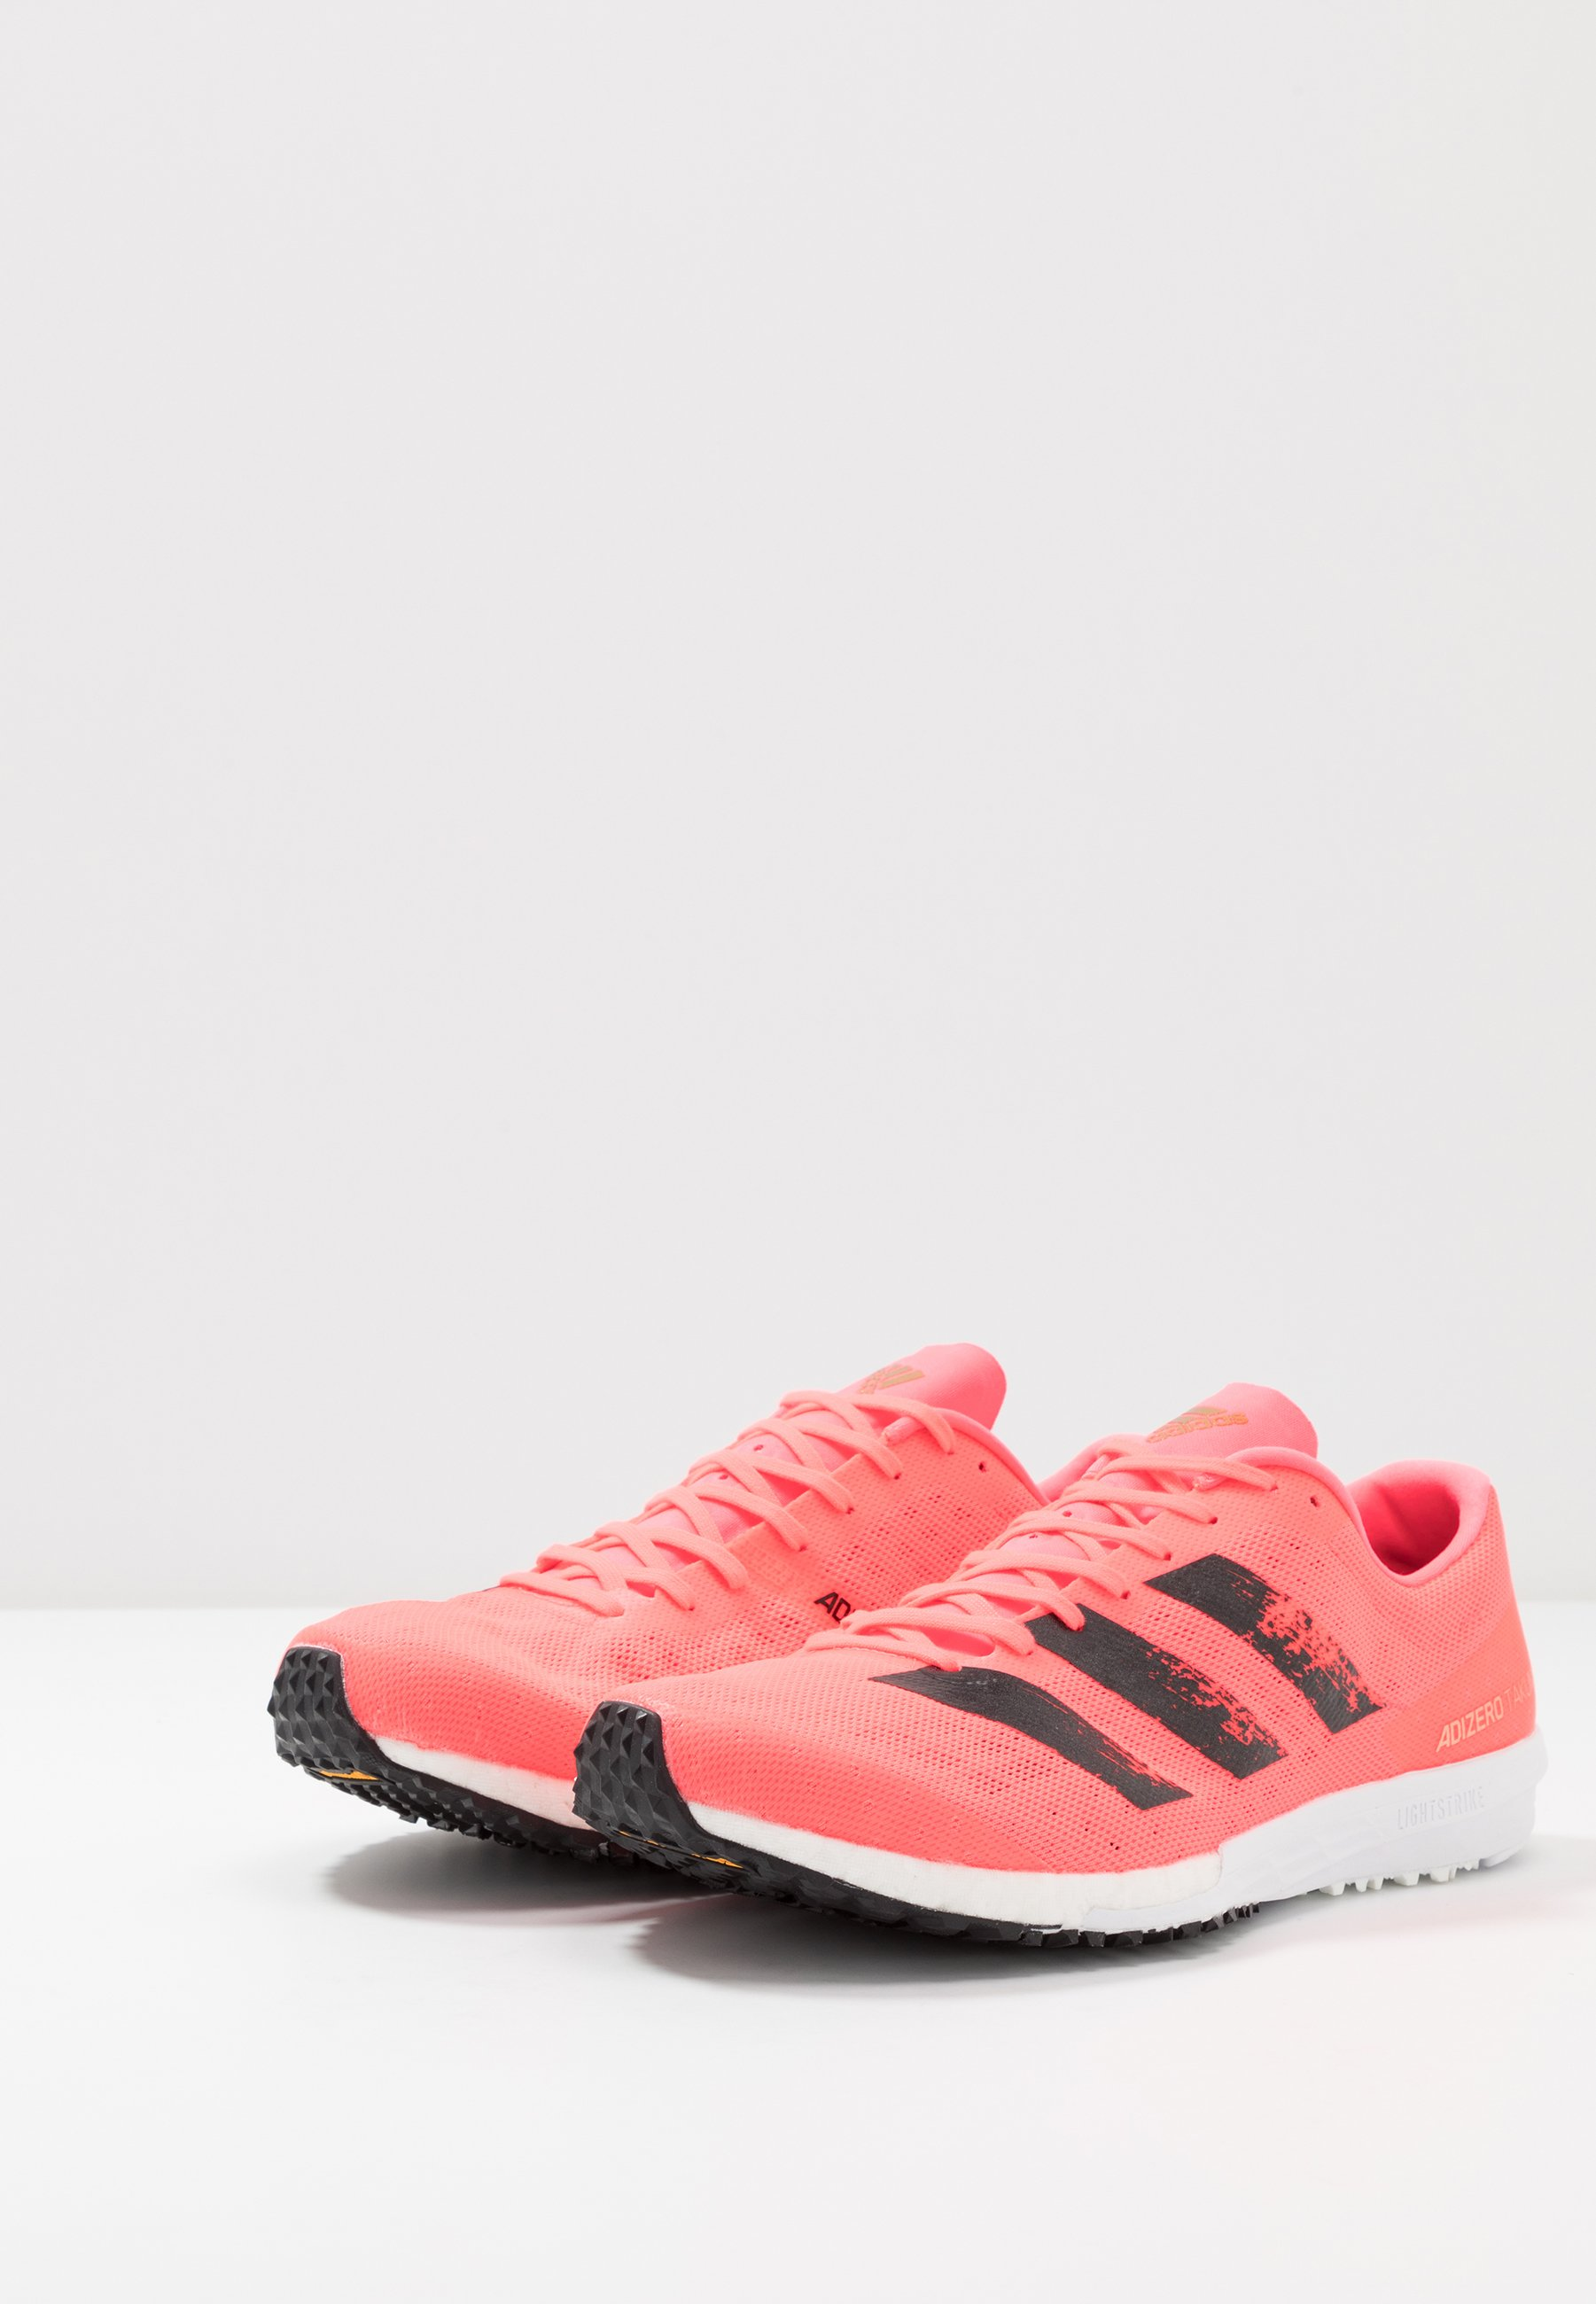 Las Compras En Línea Calzado de hombre adidas Performance ADIZERO TAKUMI SEN 6 Zapatillas de competición signal pink/core black/copper metallic VJKjcE